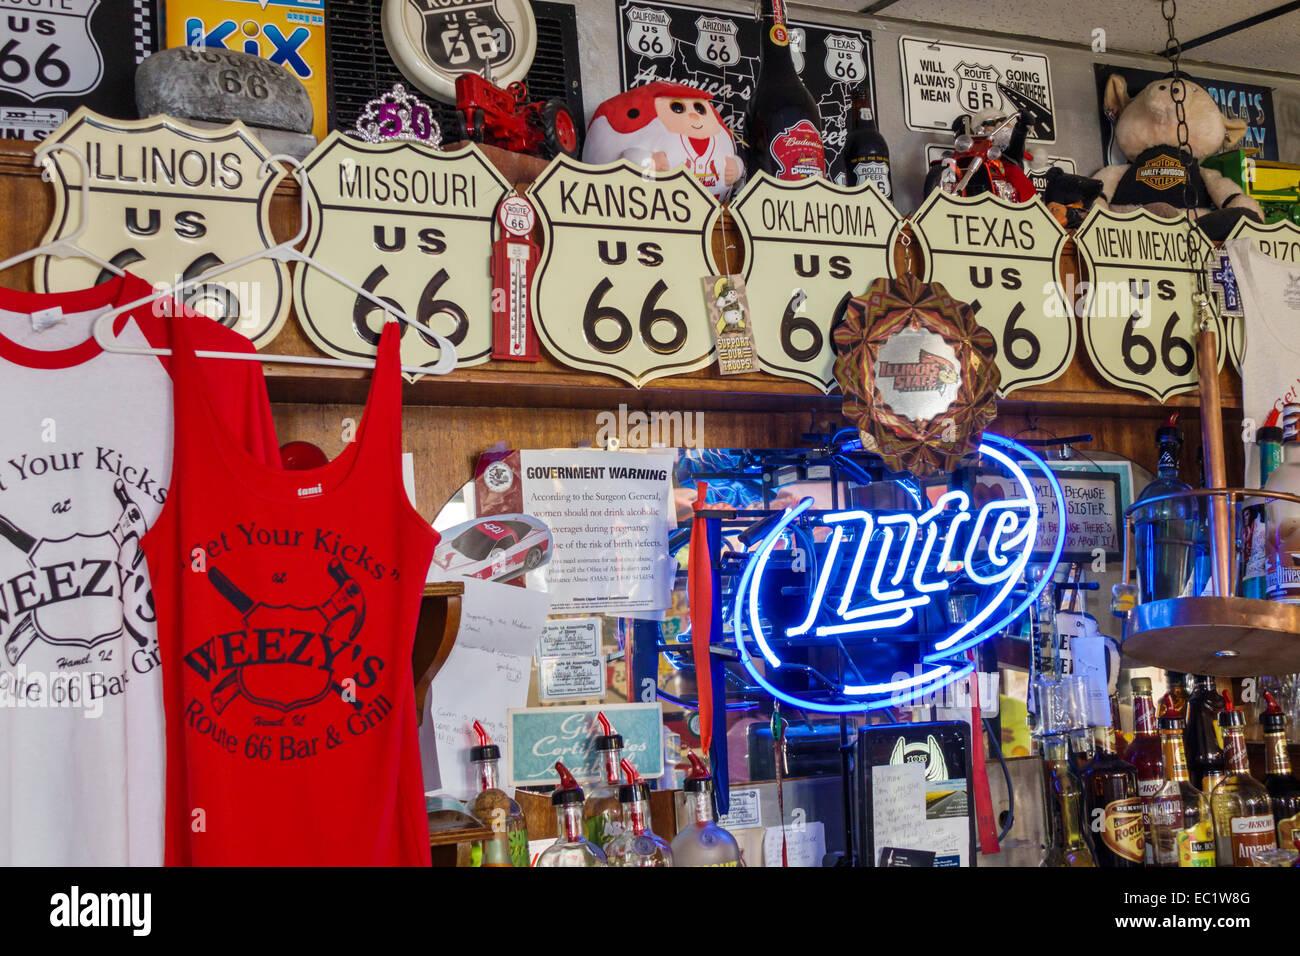 Illinois Hamel Historic Route 66 Weezy's restaurant inside interior souvenir tee shirts sale - Stock Image